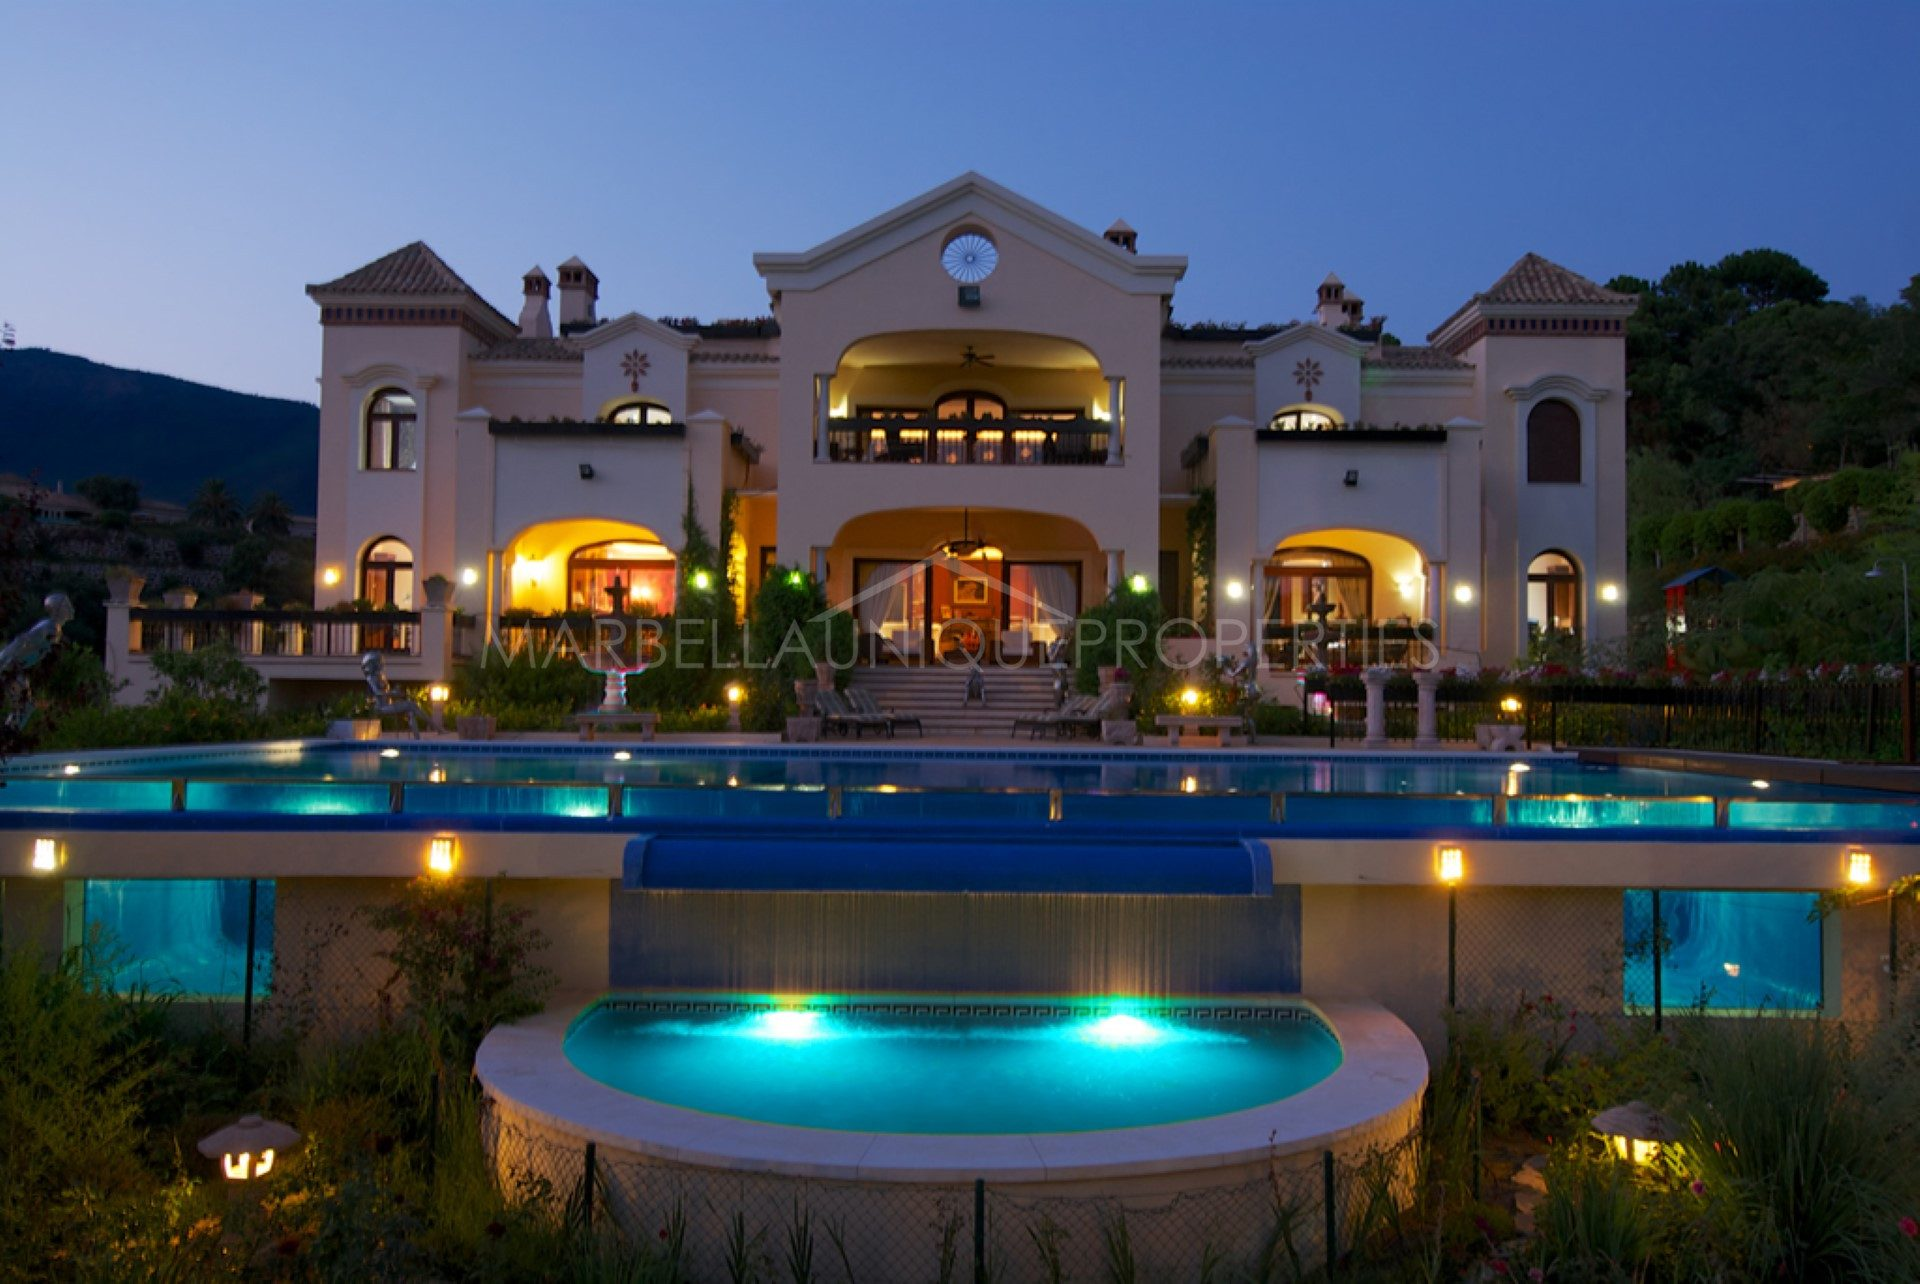 The Best Properties in La Zagaleta - Marbella Unique Properties - Spectacular 10 bedrooms mansion in La Zagaleta, 9.995.000€